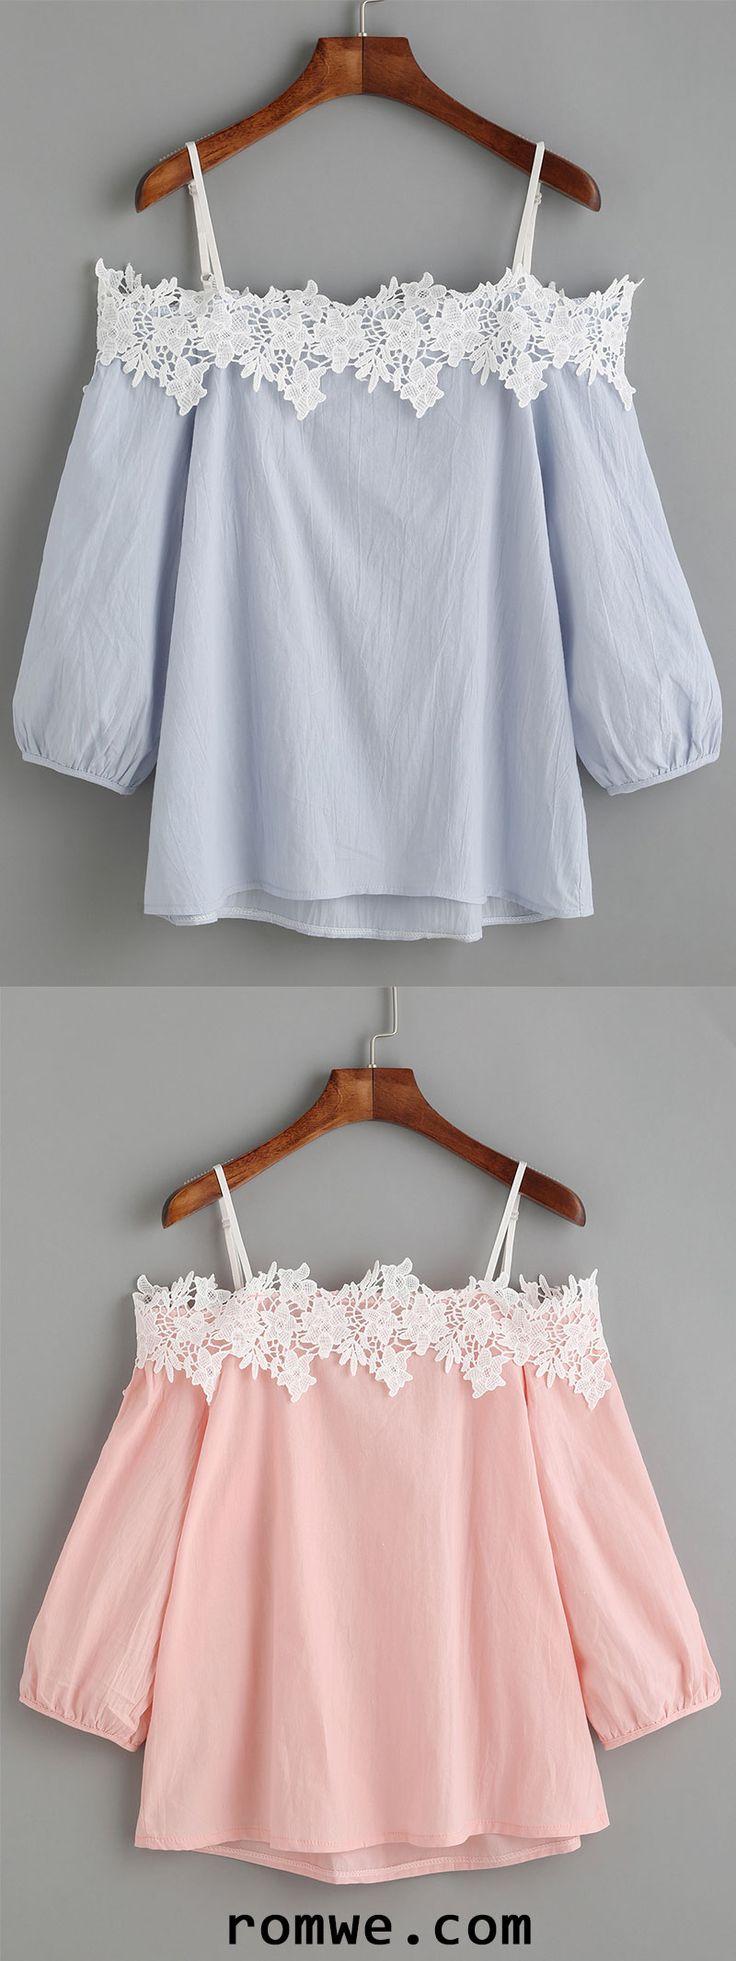 Embroidered Lace Applique Cold Shoulder Blouse